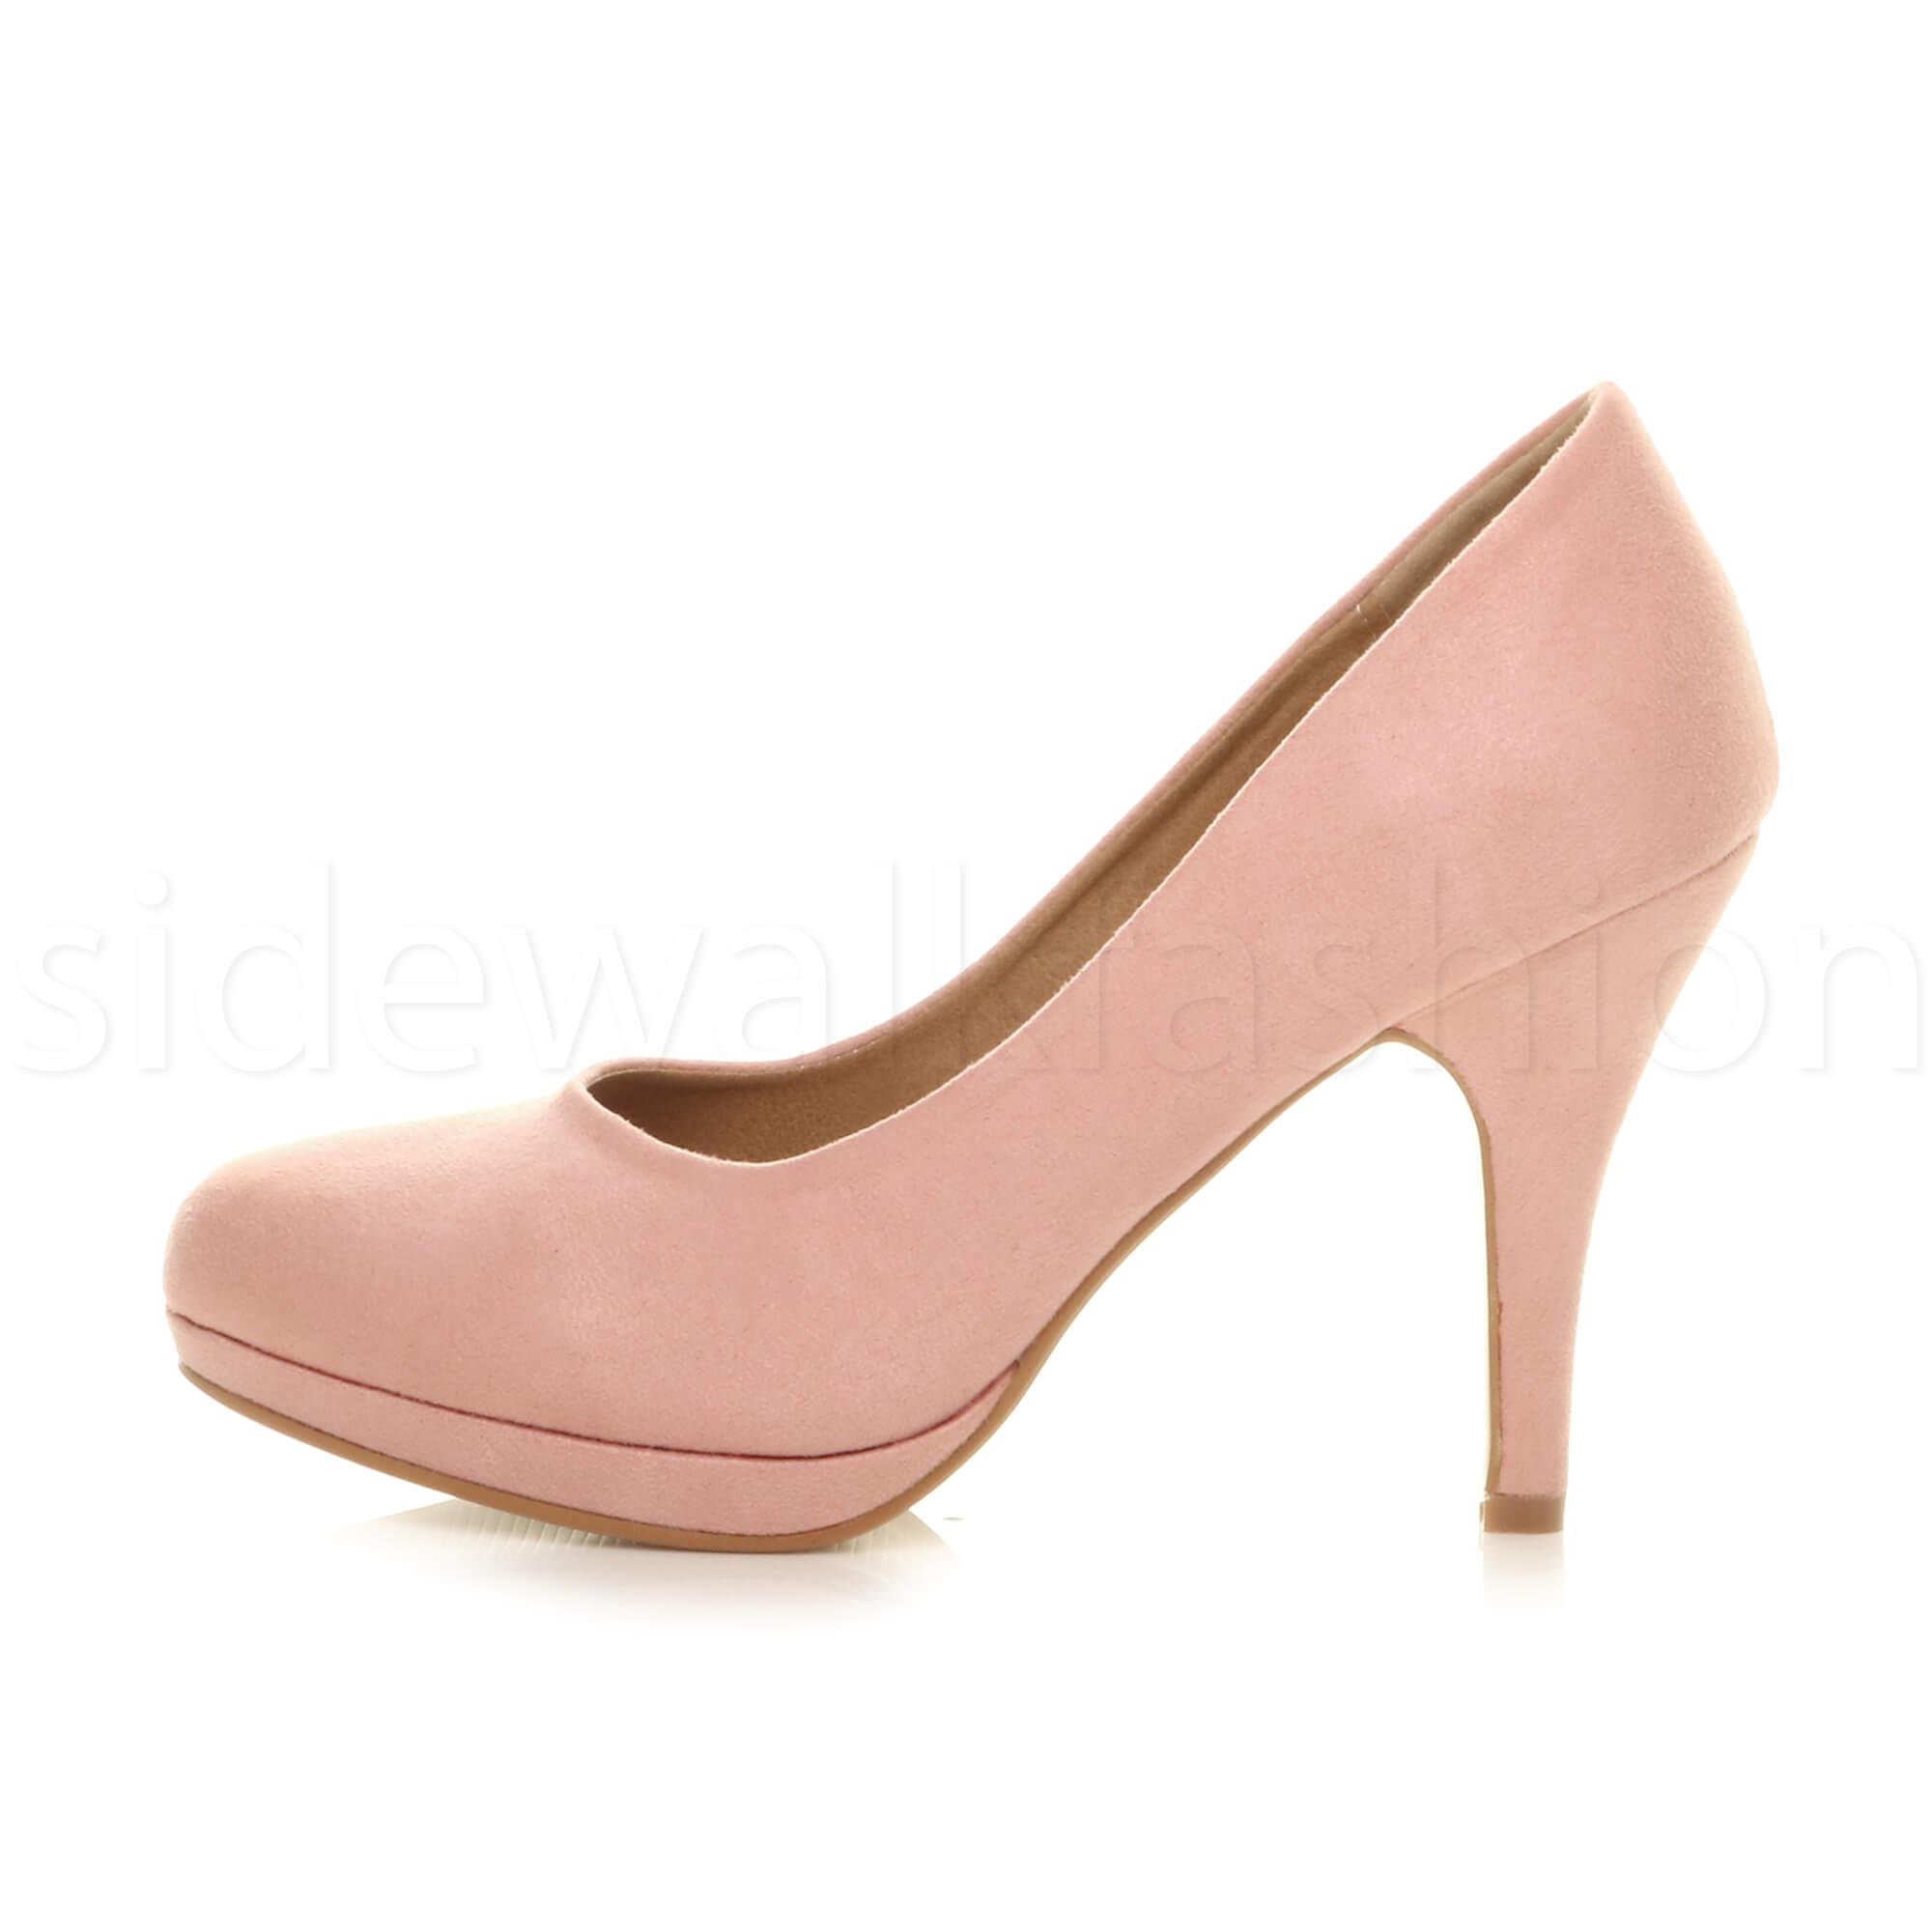 Womens-ladies-high-mid-heel-platform-wedding-evening-bridesmaid-court-shoes-size thumbnail 3